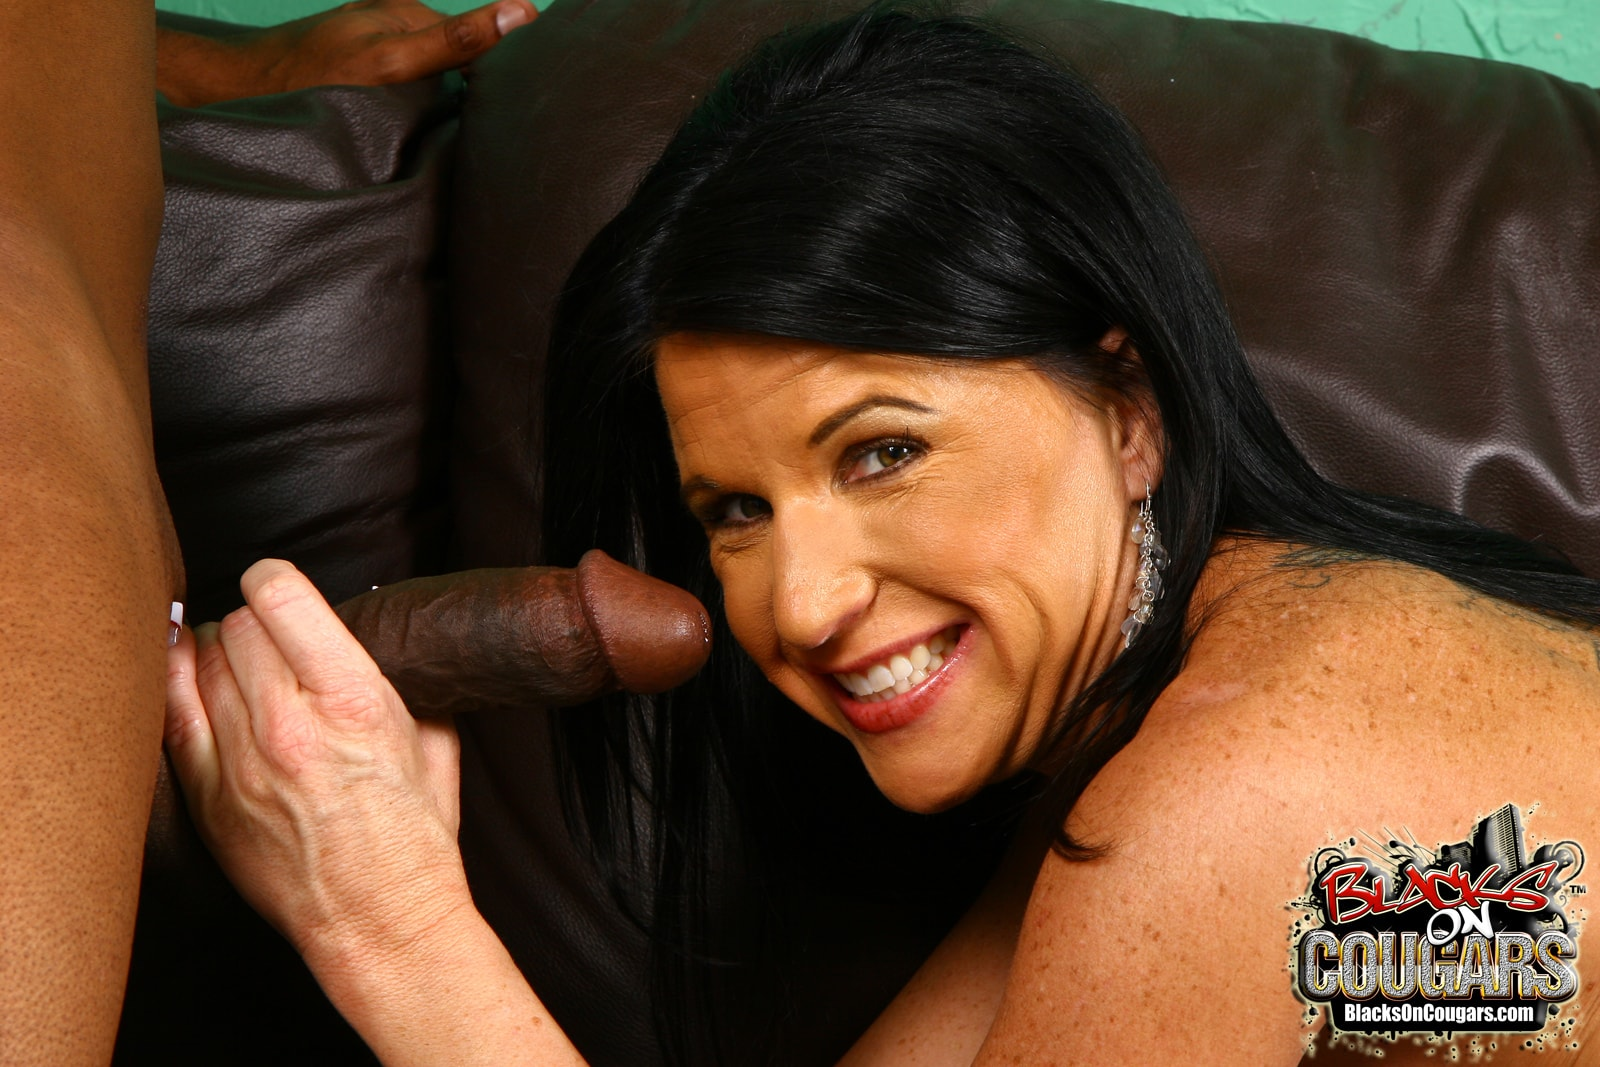 Dogfart '- Blacks On Cougars' starring Kendra Secrets (Photo 25)